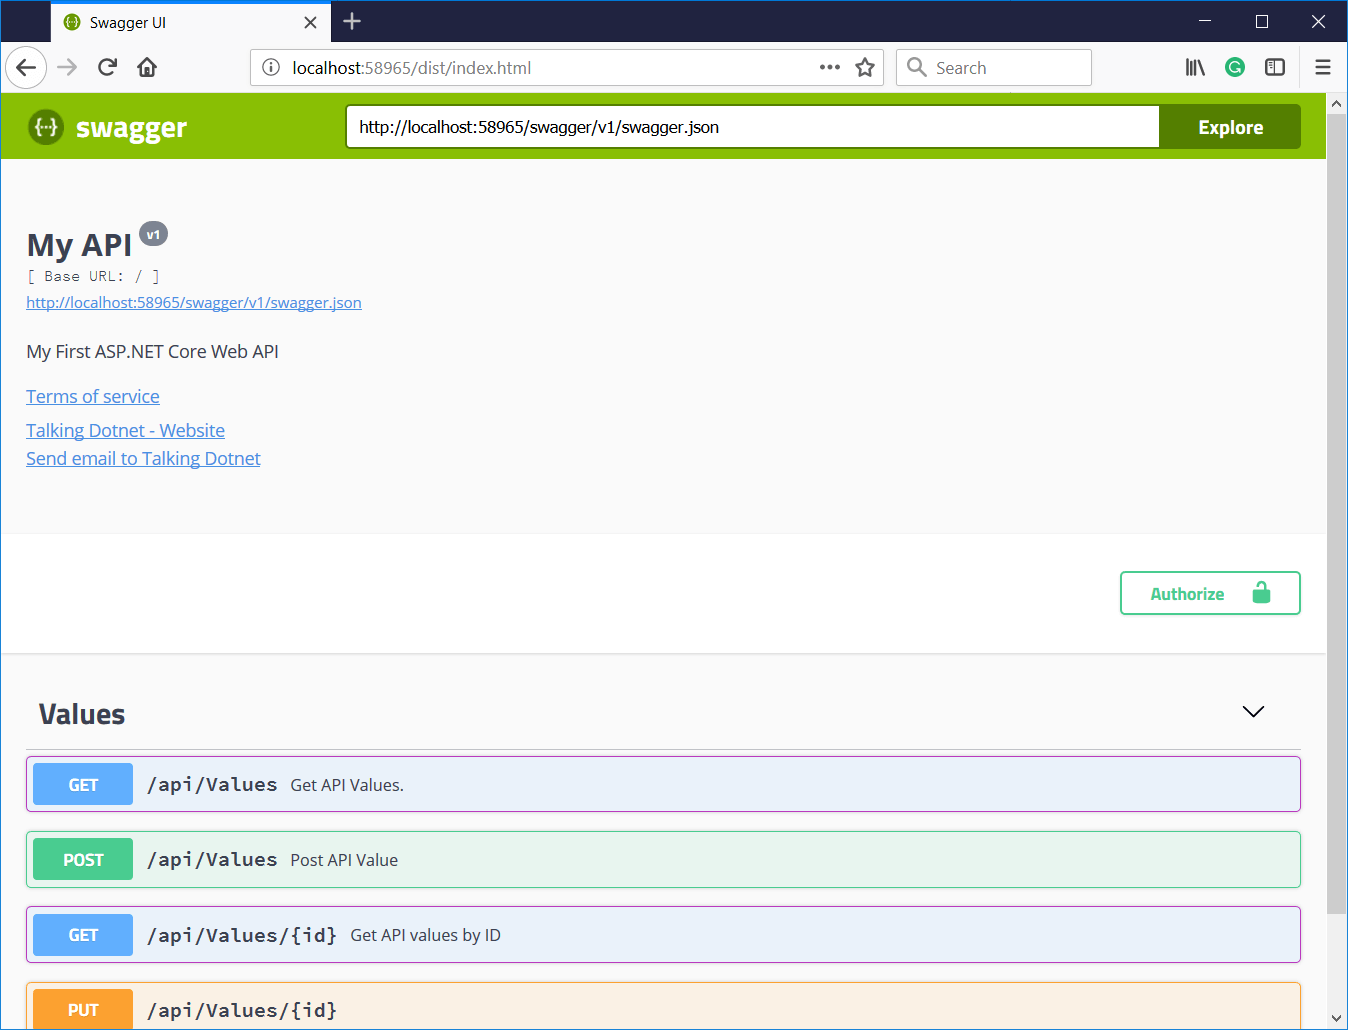 Create Petstore like Swagger UI for ASP.NET Core WEB API